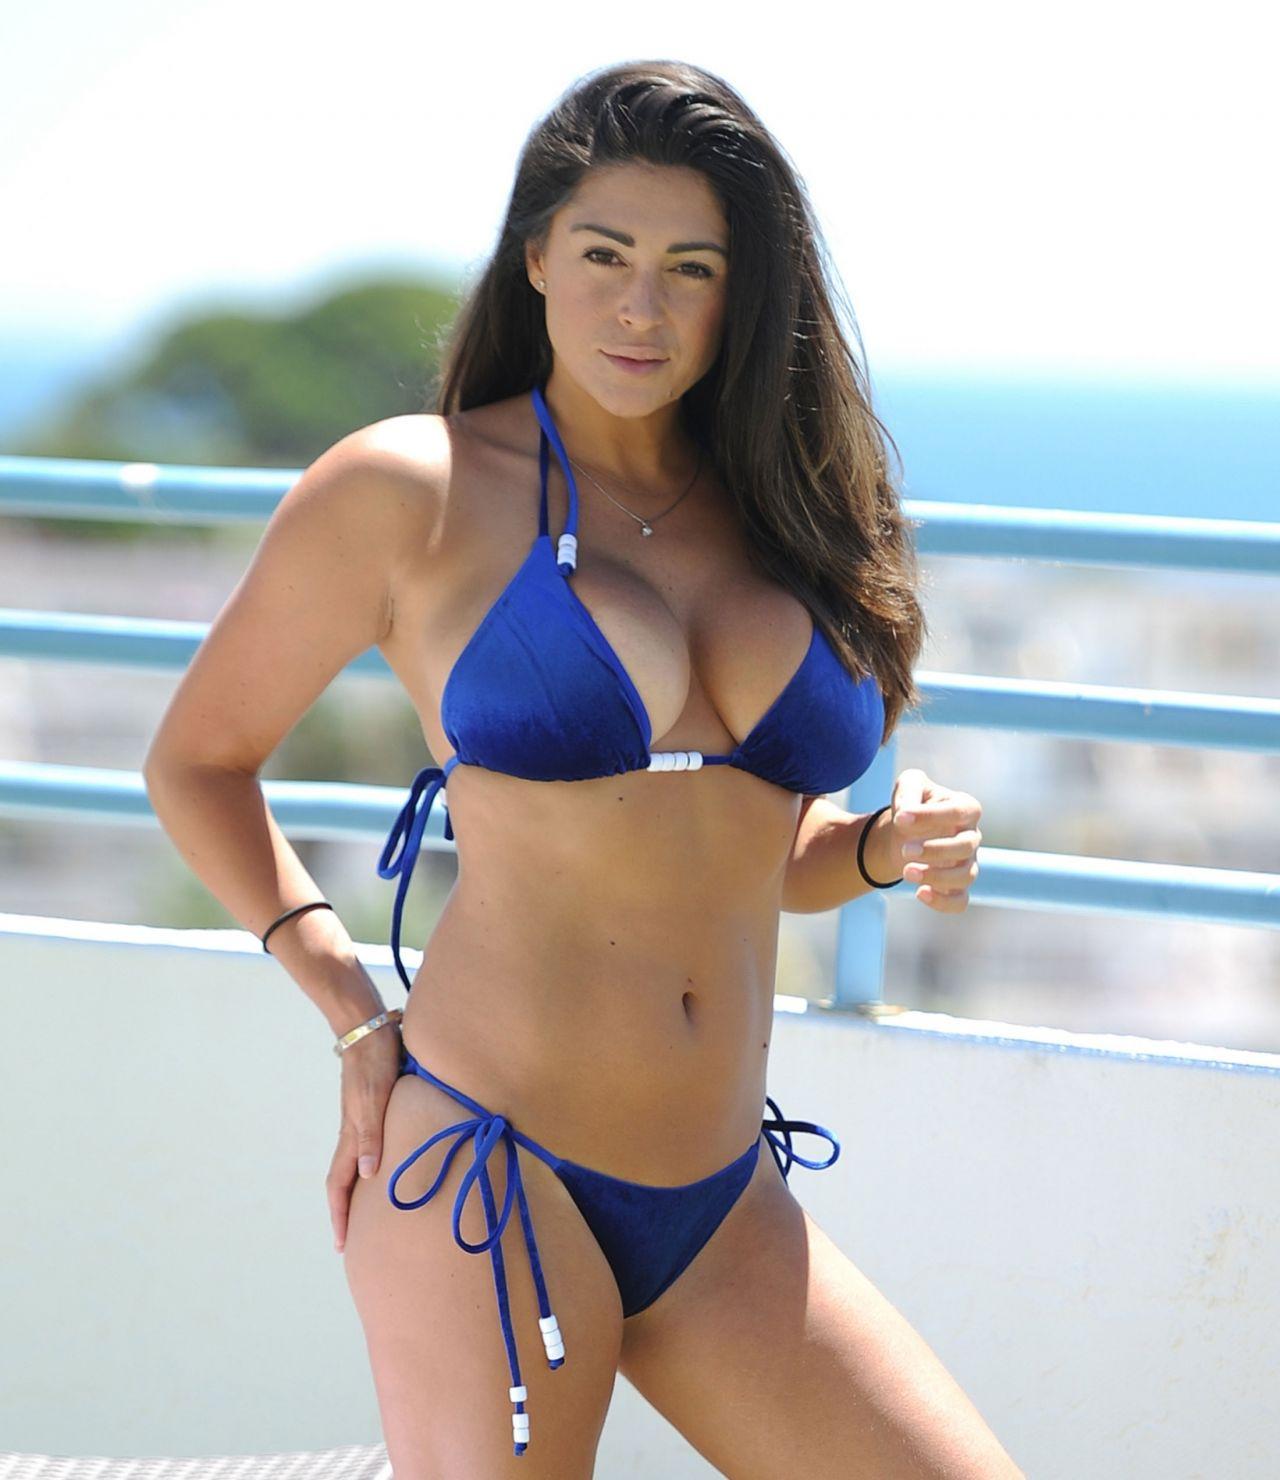 Casey Batchelor in Blue Bikini in Cyprus Pic 2 of 35